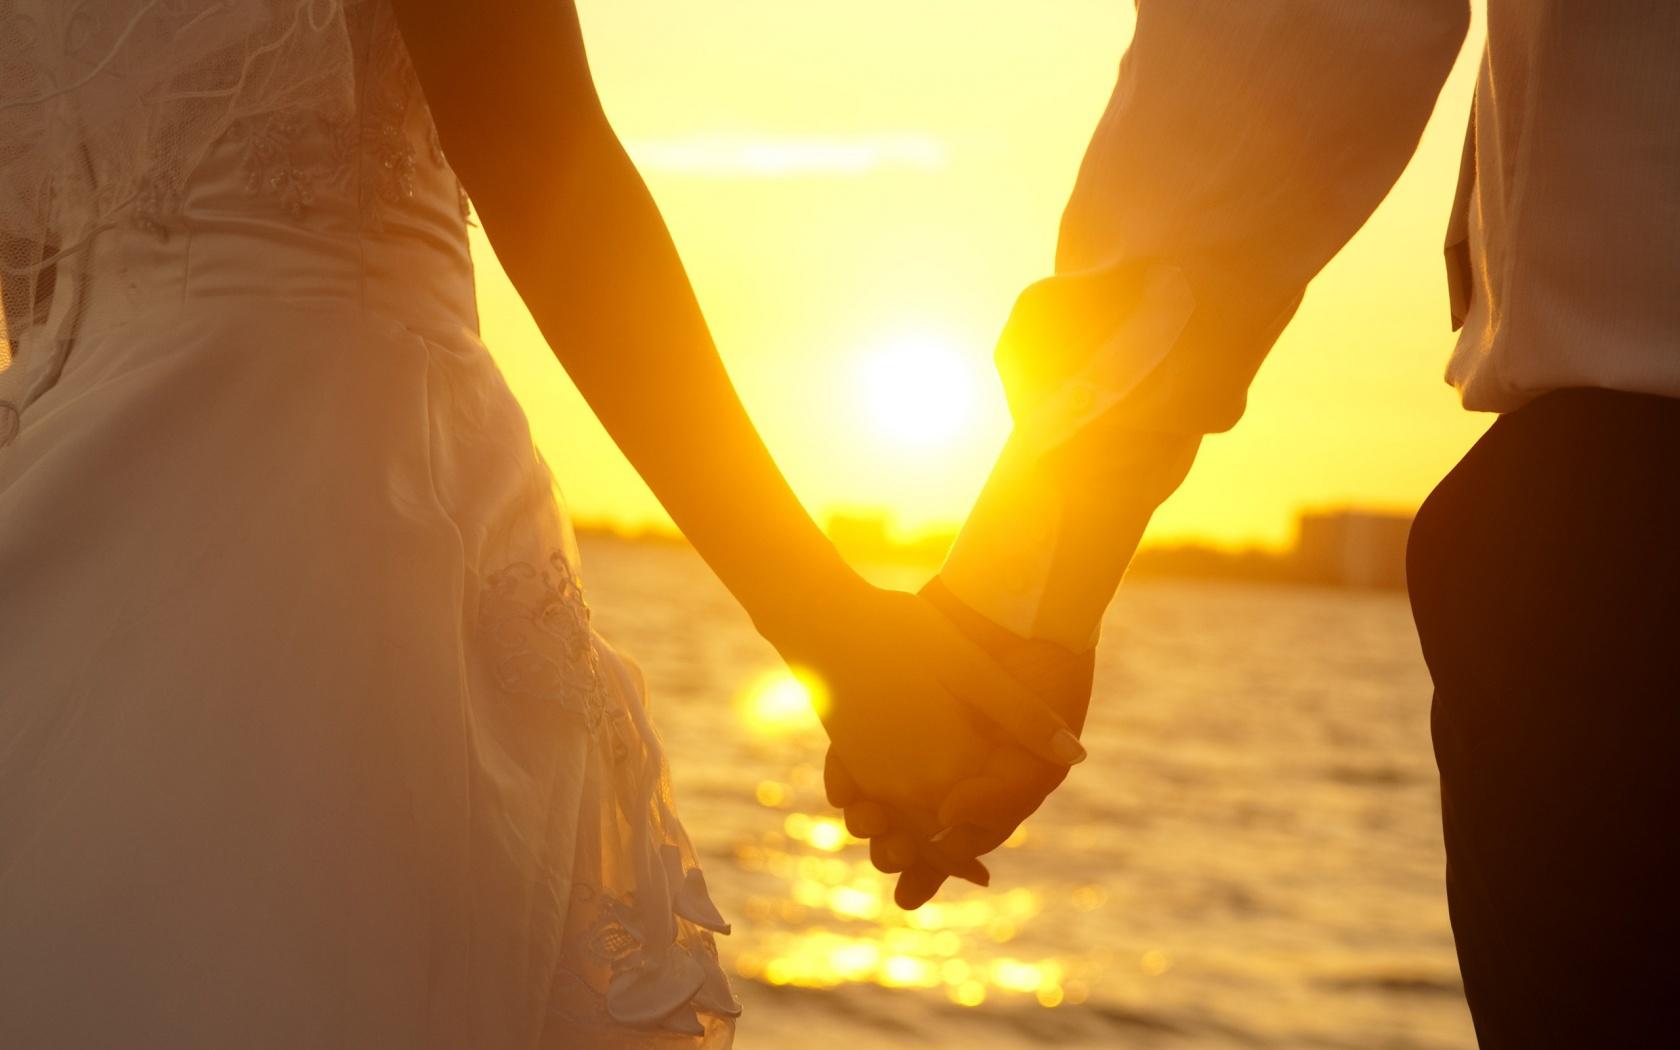 love_holding_hands_wallpapers_hd.jpg